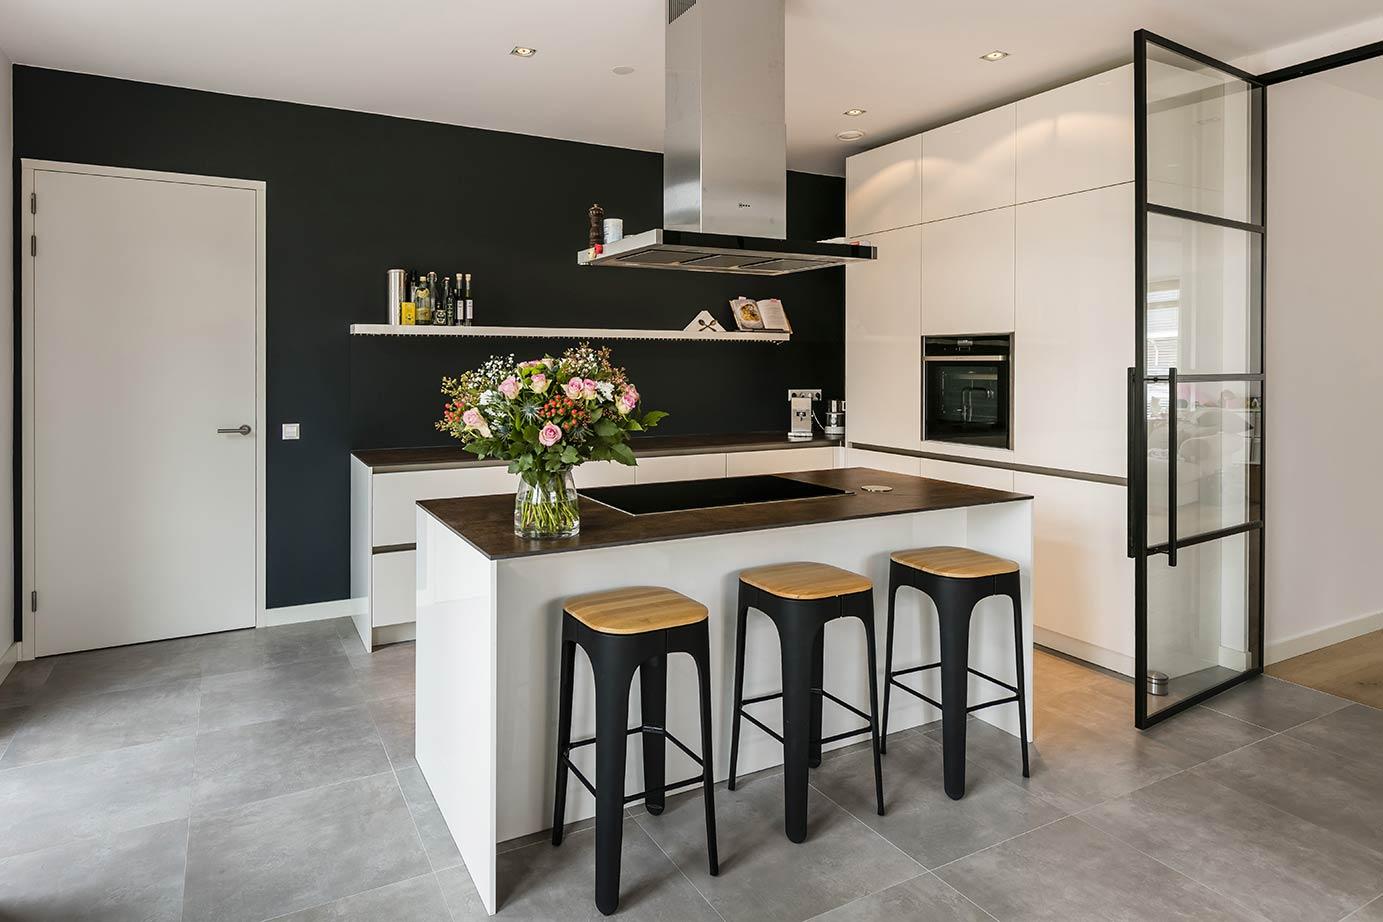 Hoogglans Witte Keuken : Bloksma keukens keukens